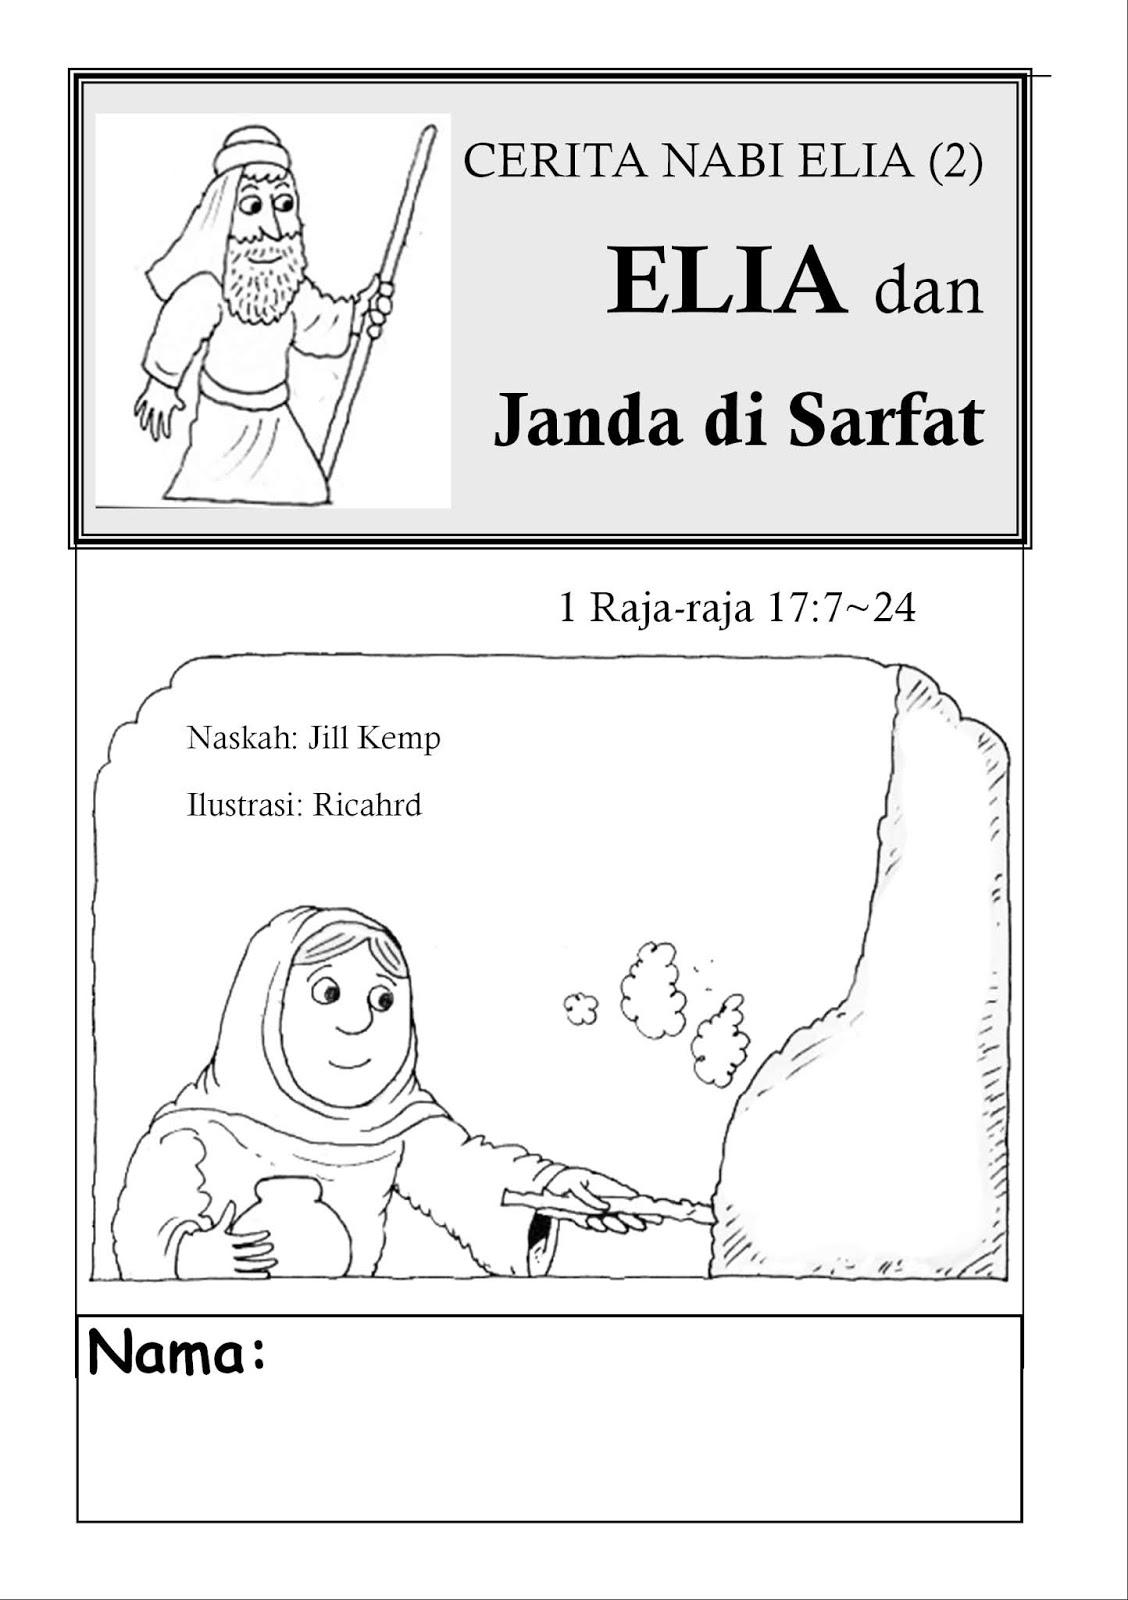 Cerita Nabi Elia 2 Elia Dan Janda Di Sarfat